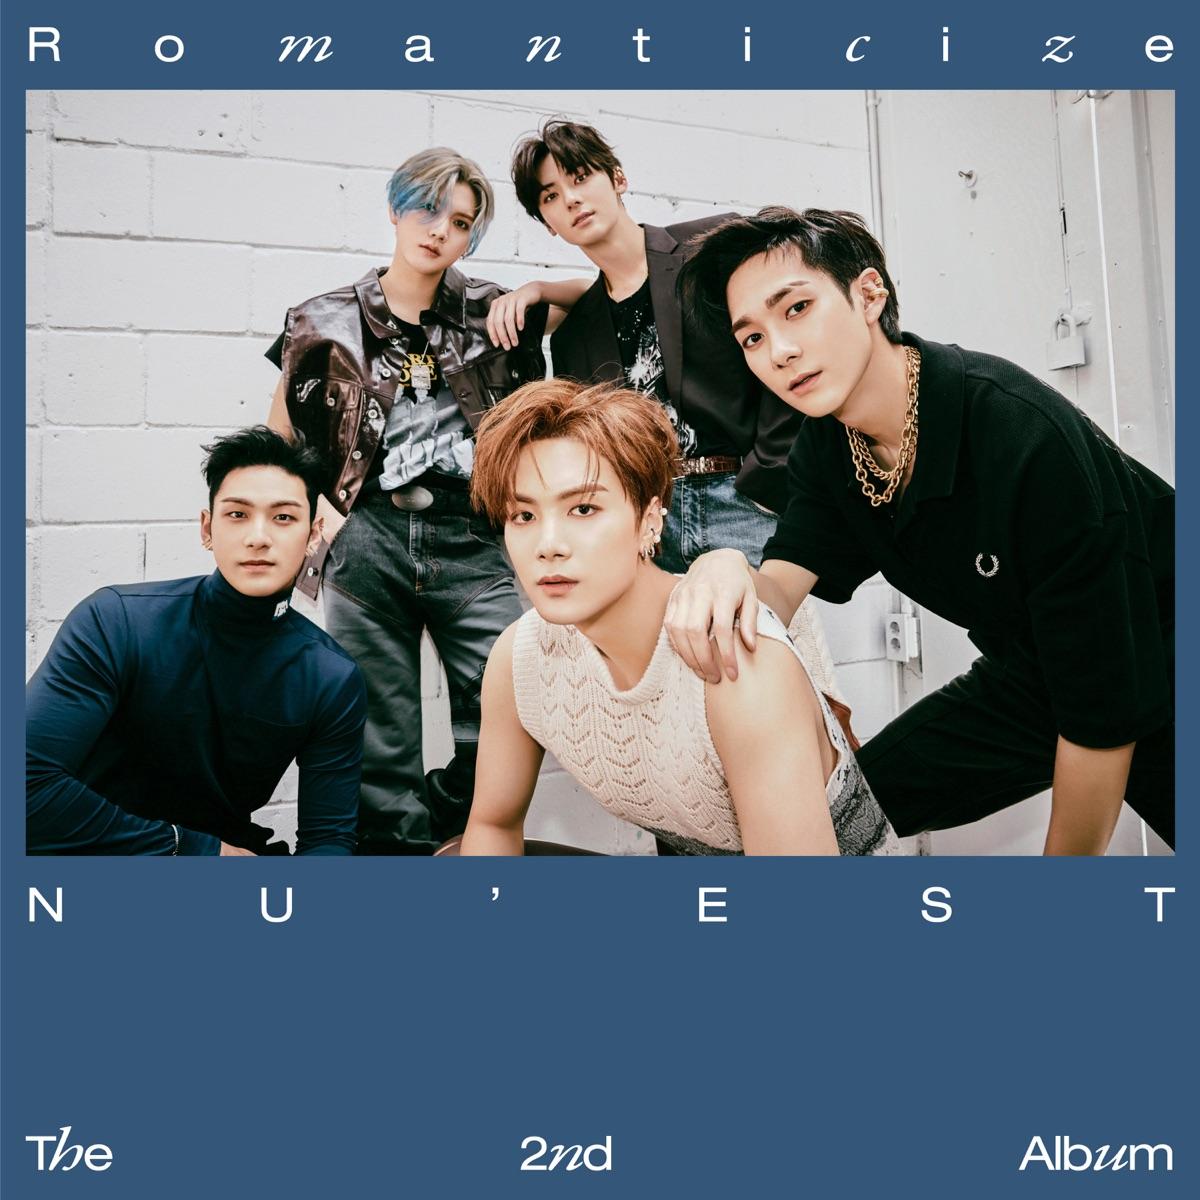 『NU'EST - INSIDE OUT』収録の『The 2nd Album 'Romanticize'』ジャケット